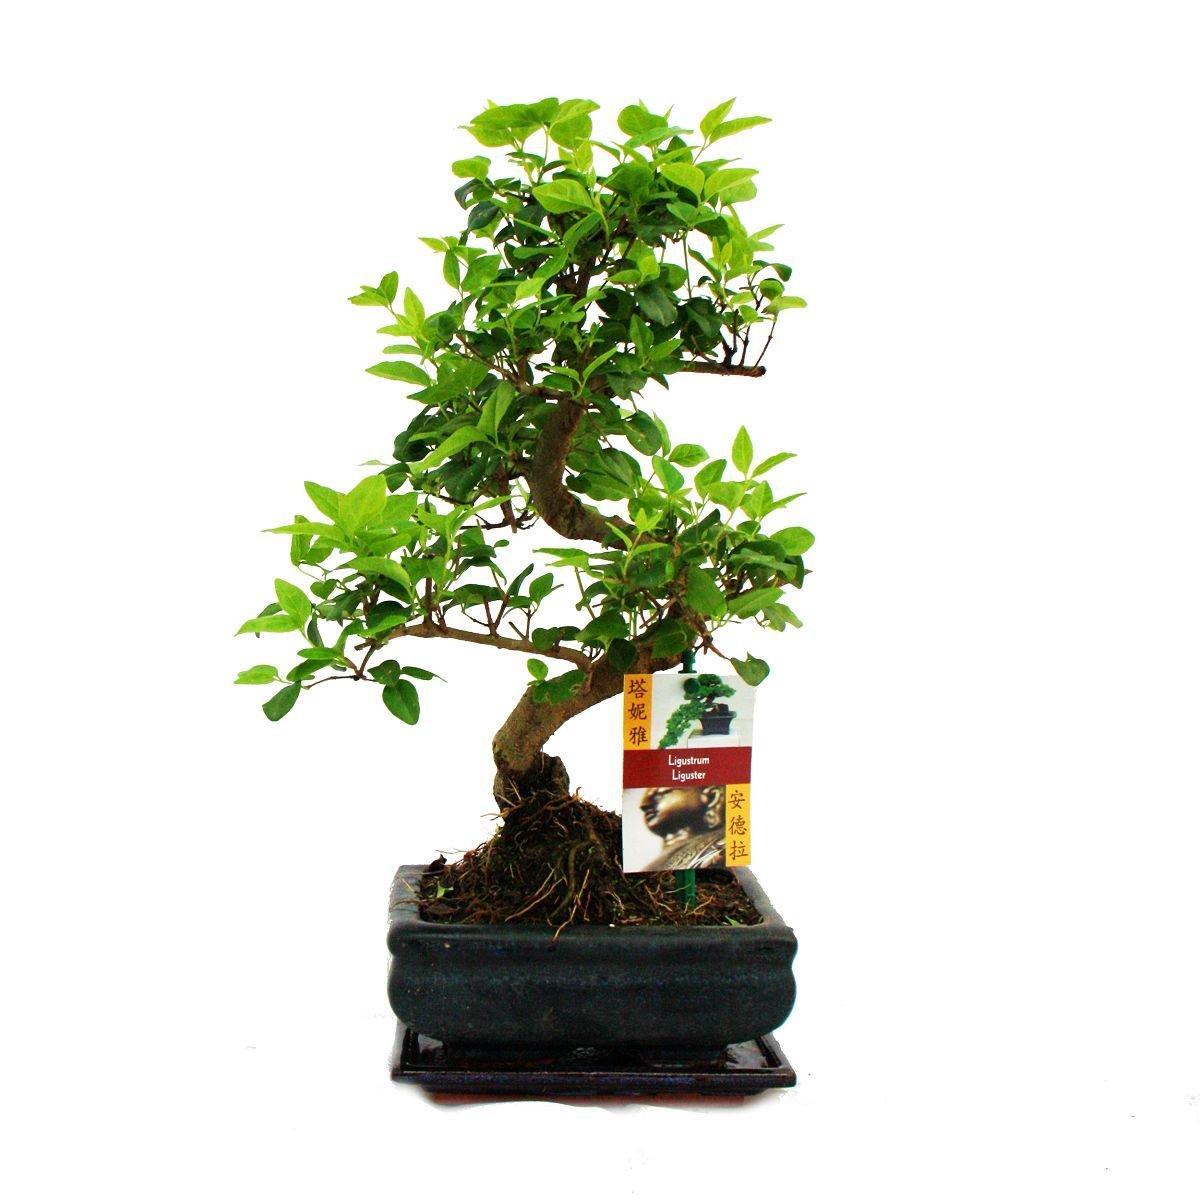 Bonsai Ligustrum 7 yrs old - 1 tree Gardens4you